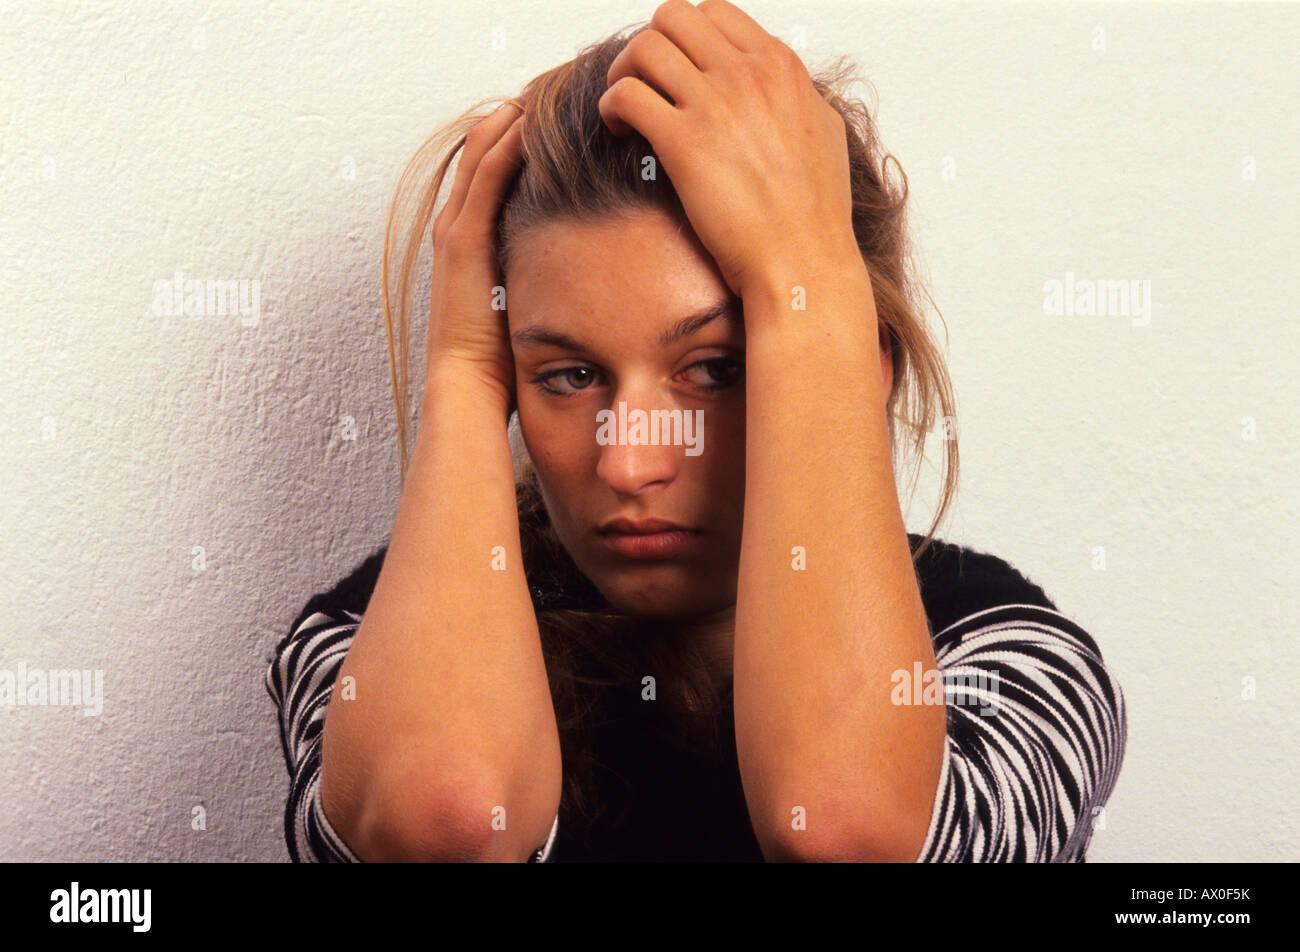 Sad woman - Stock Image